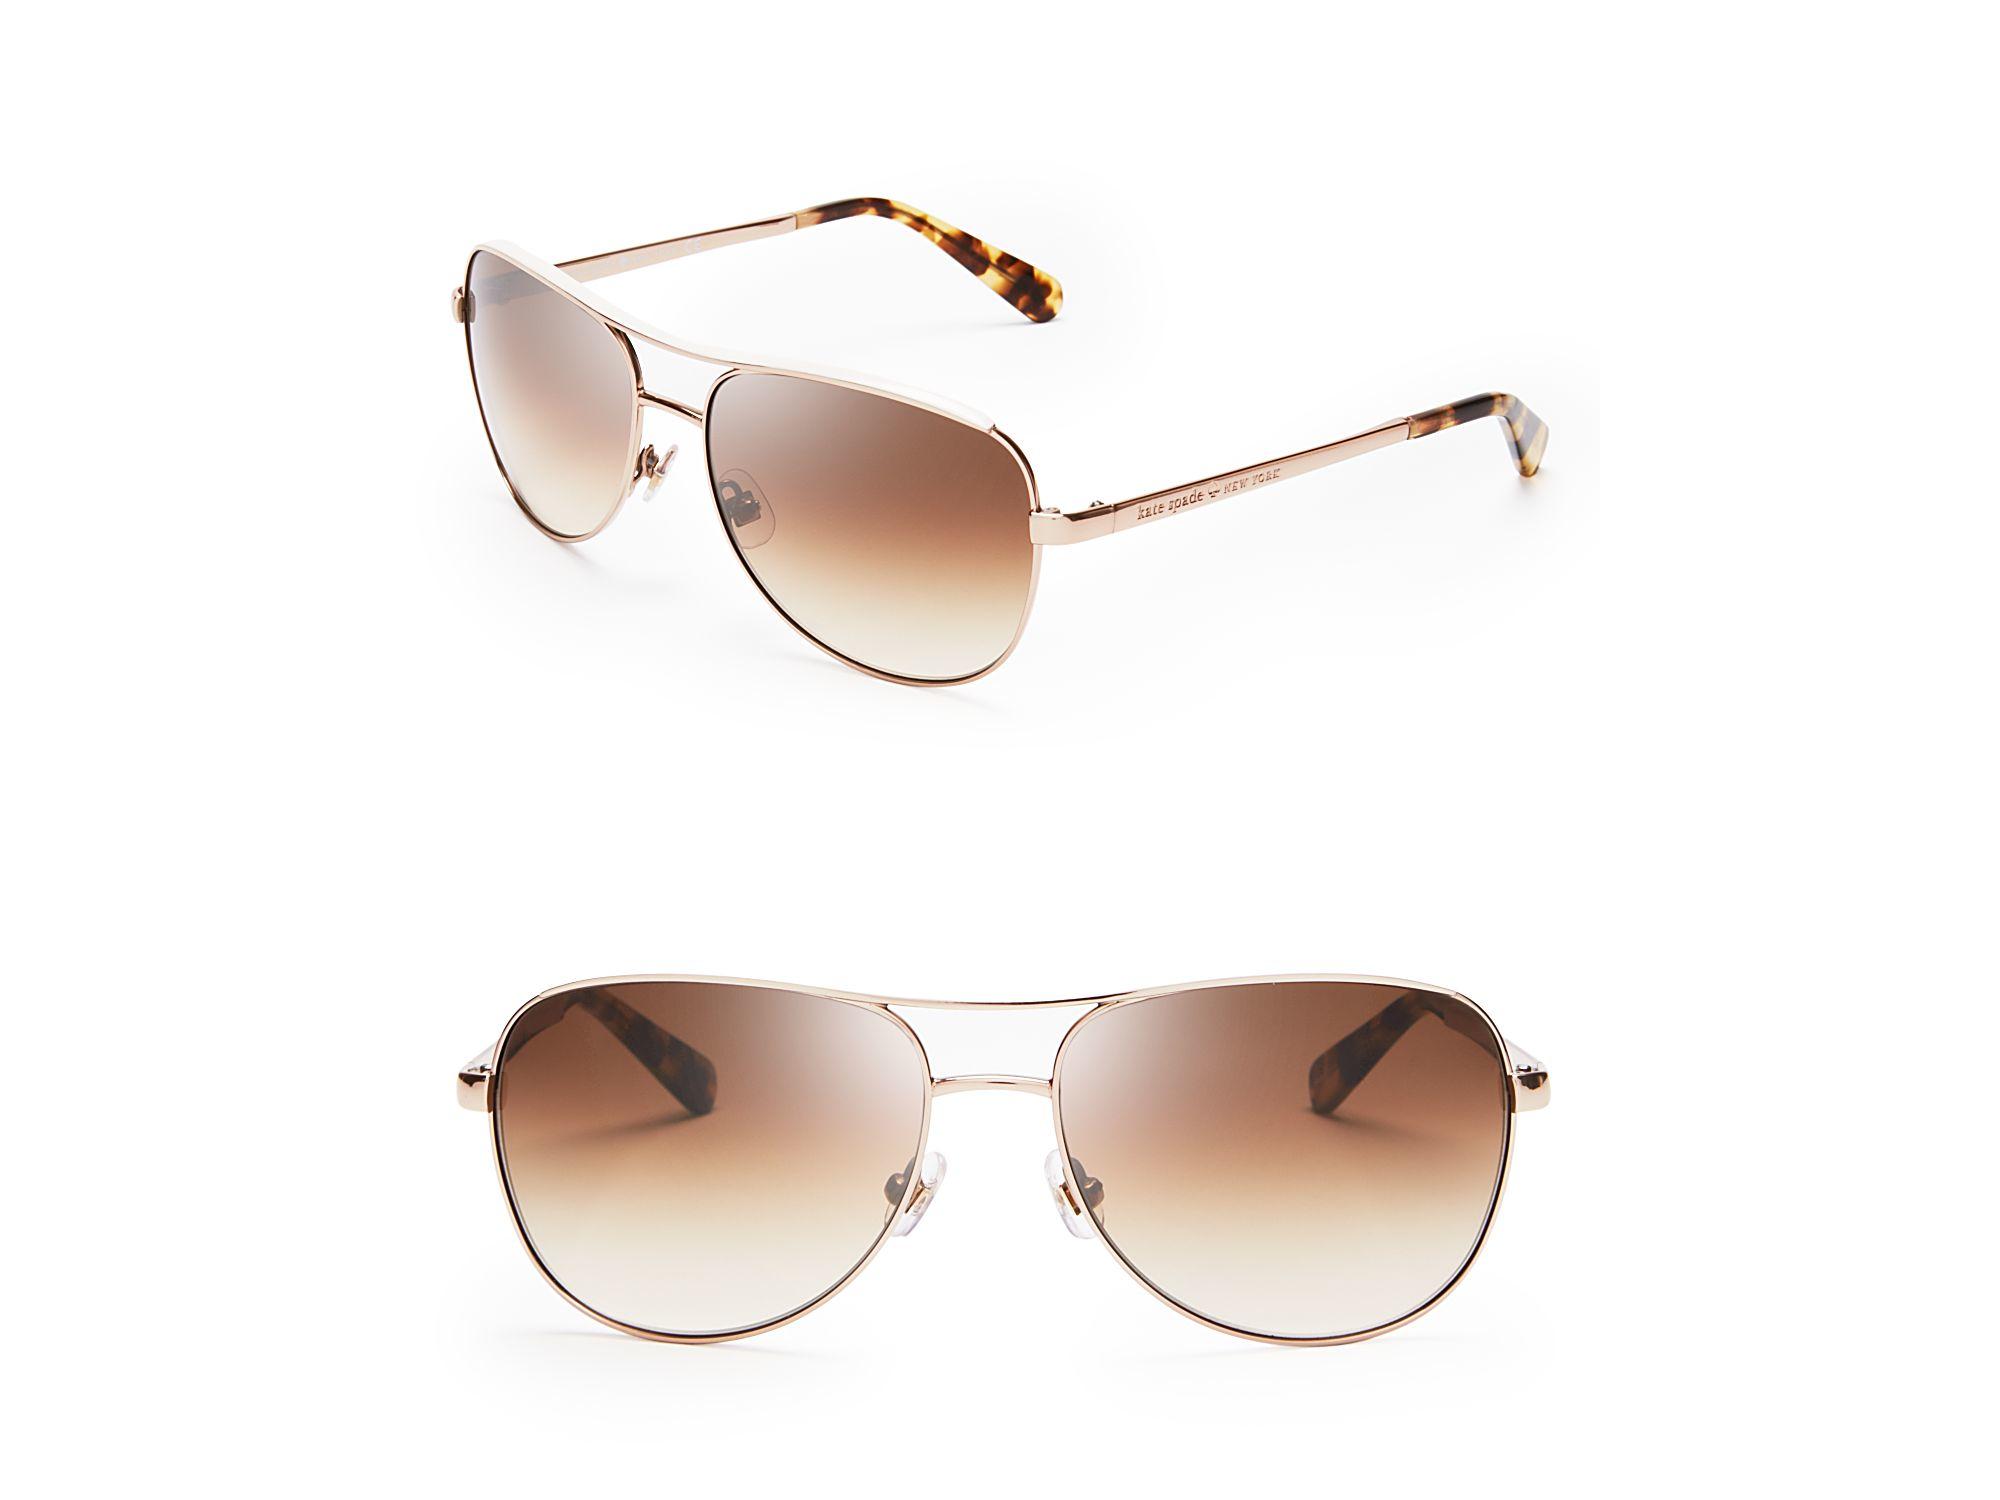 d1d2906760 Lyst - Kate Spade Dusty Aviator Sunglasses in Pink